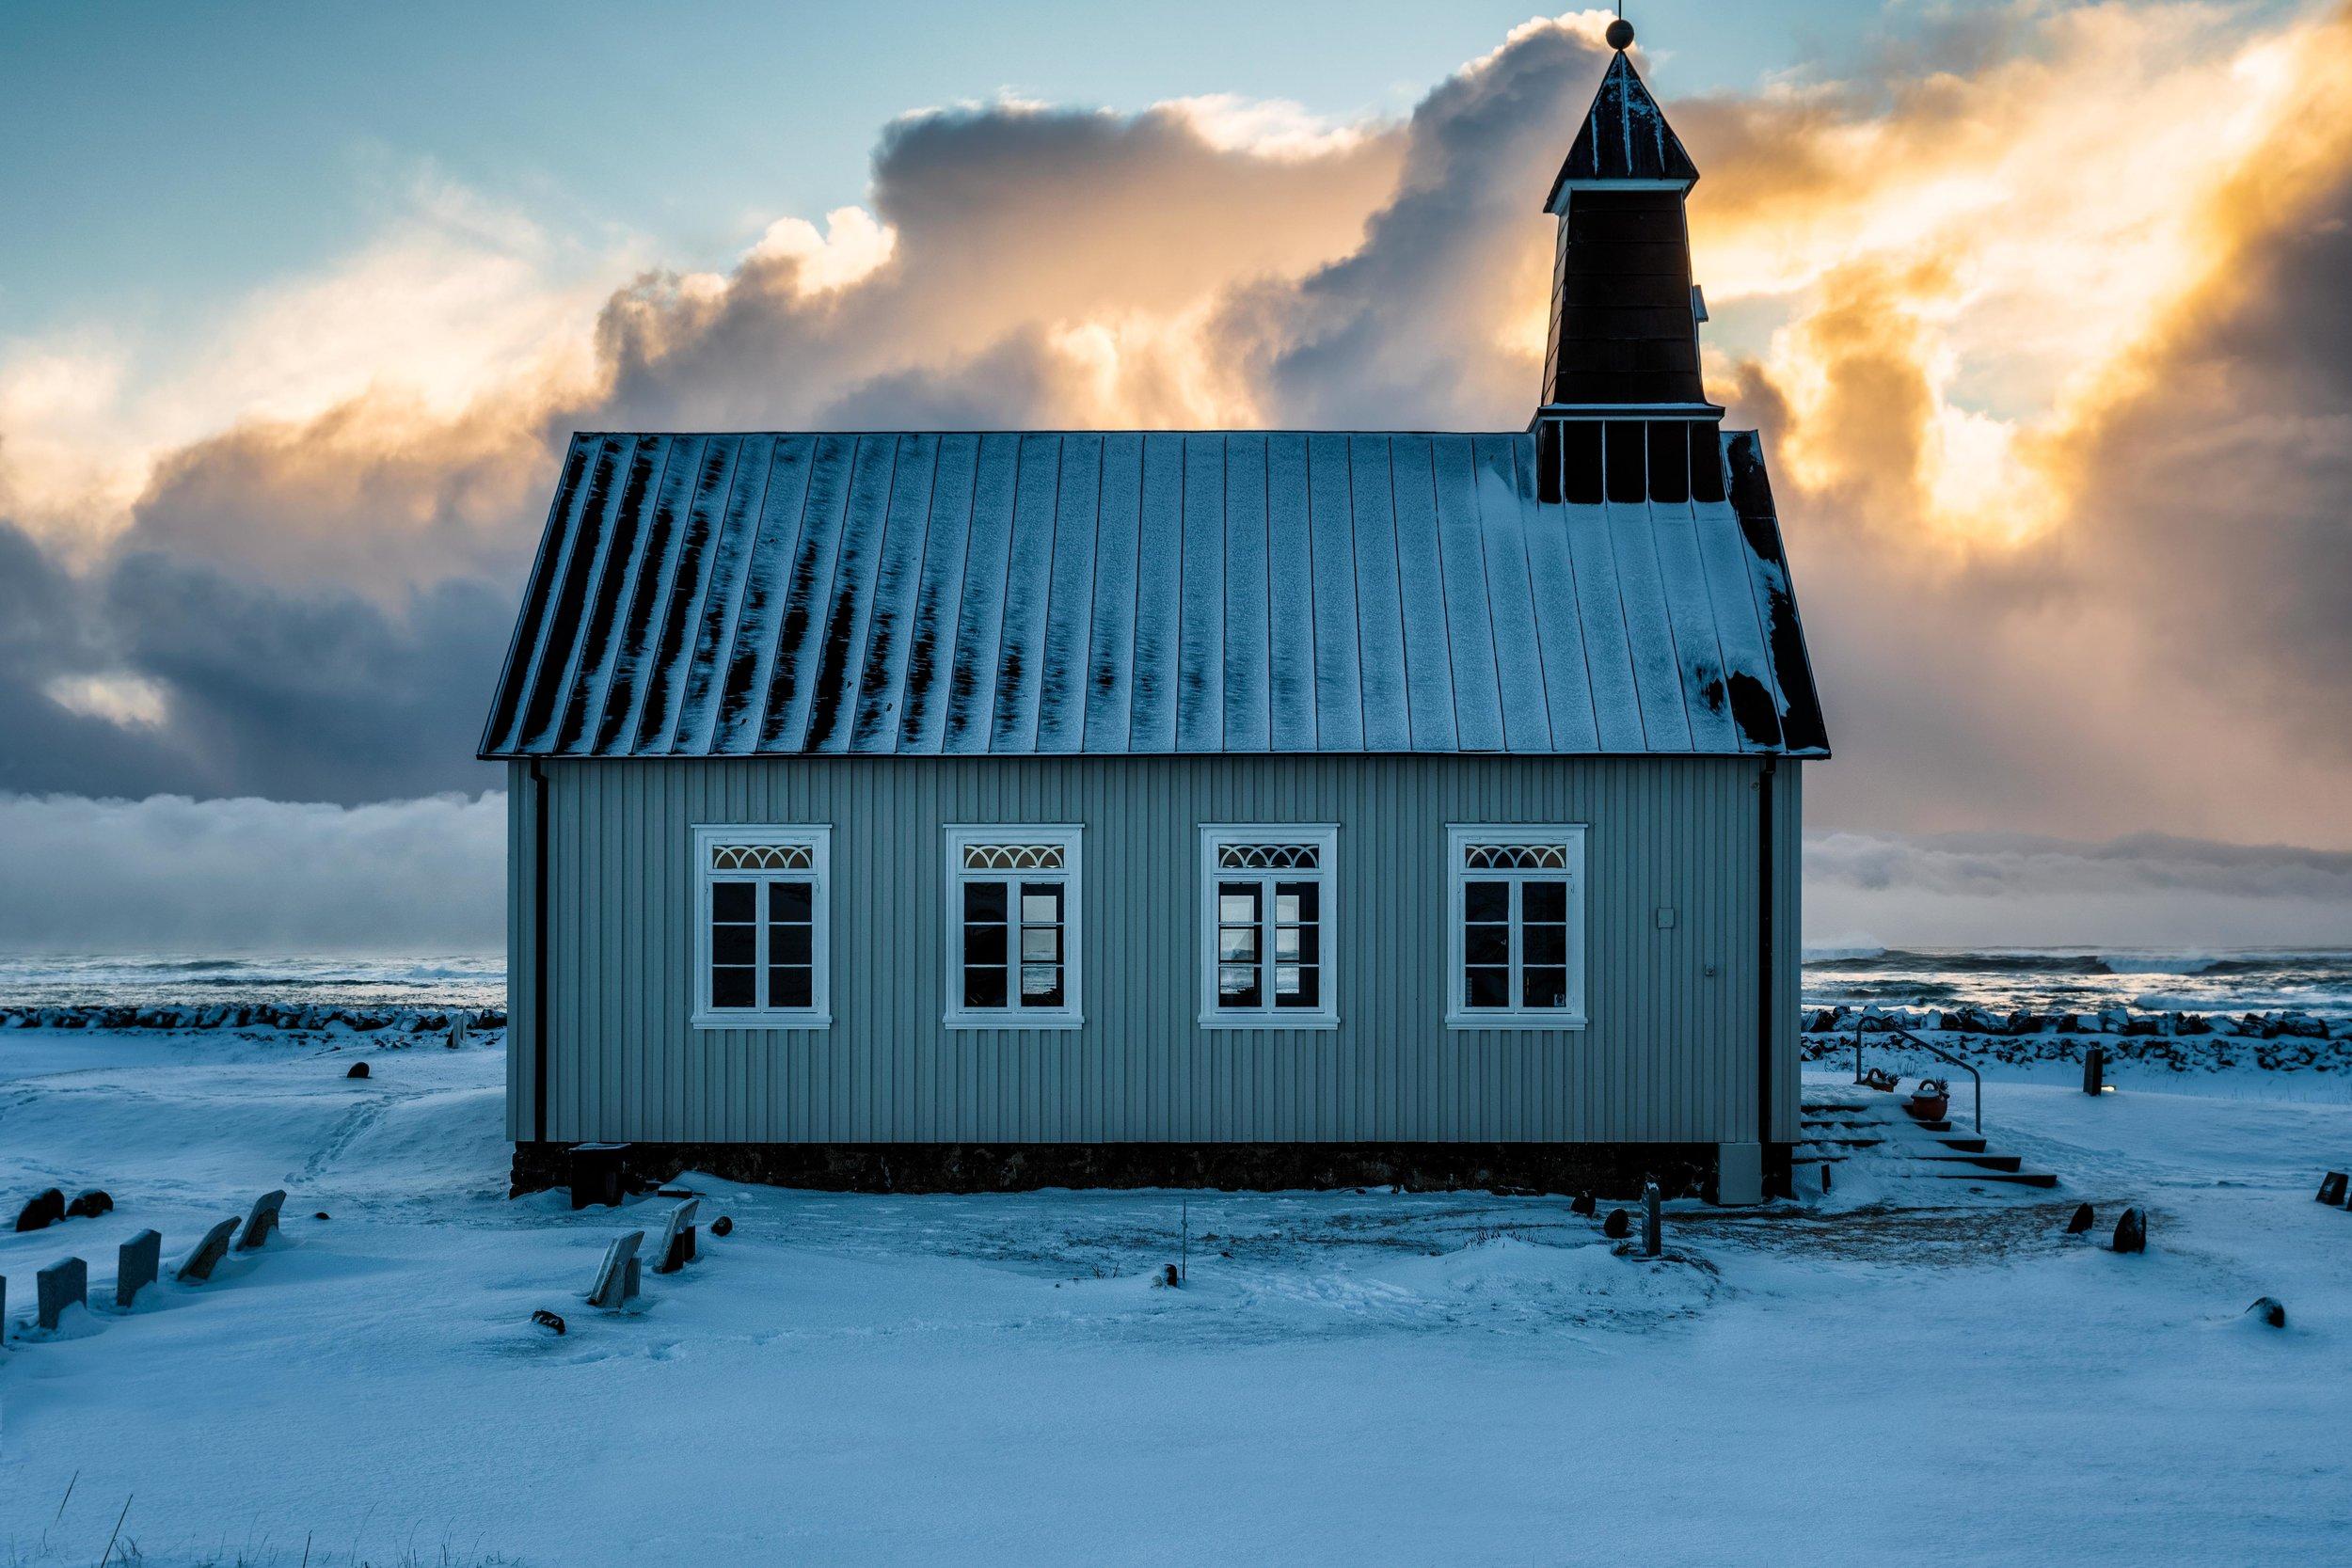 Iceland. snow. travel. adventure. photography. trip. epic landscape. snow. cold. freezing. sunrise. nothern lights. insagram church.jpg